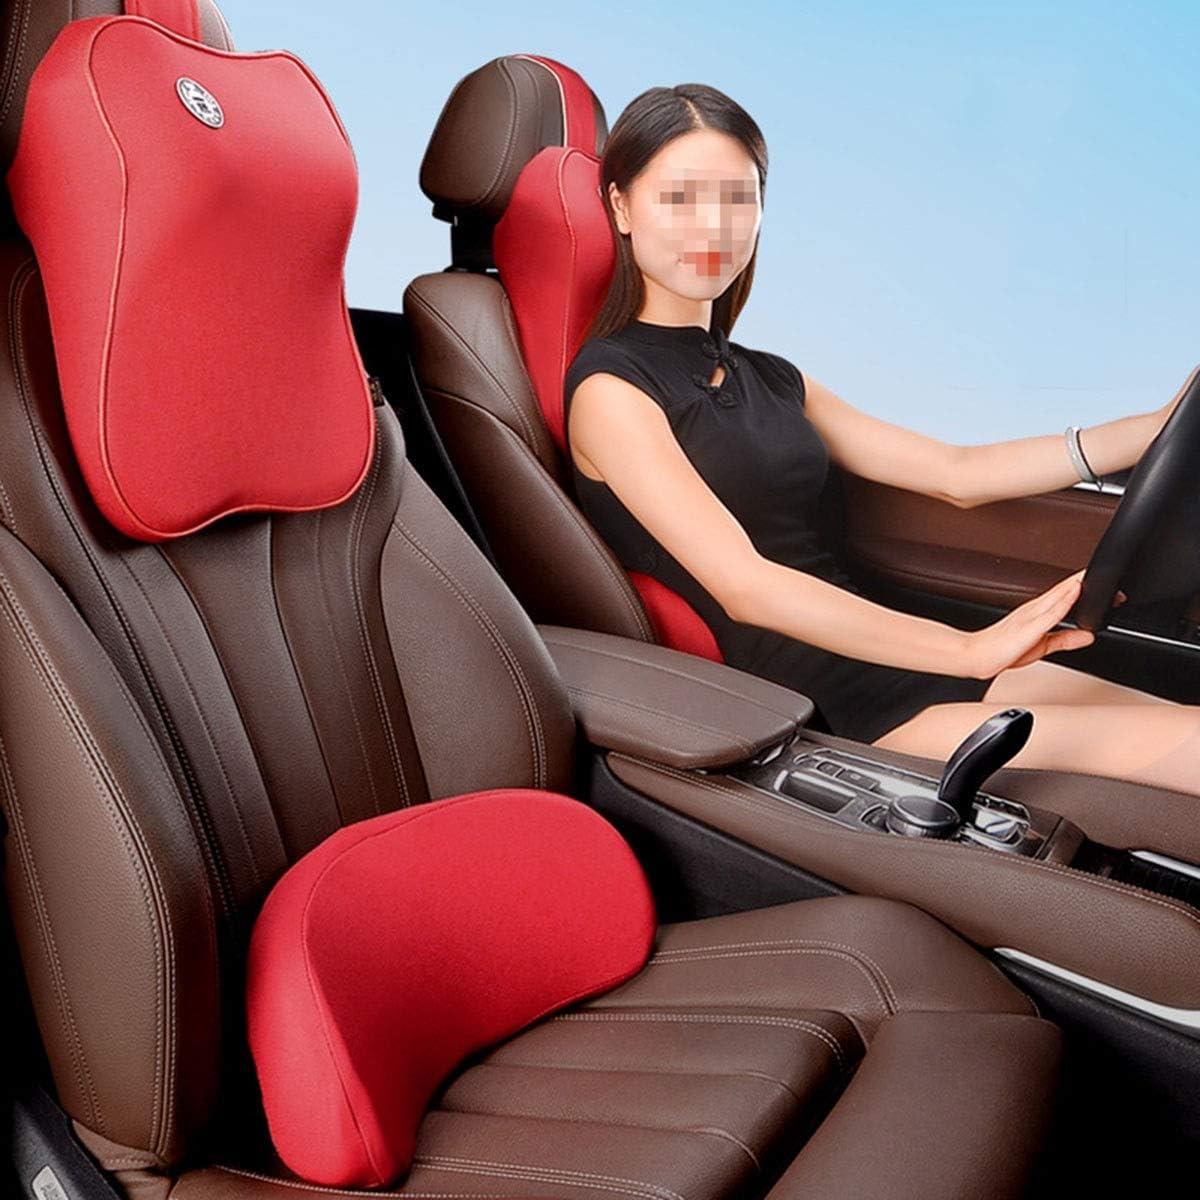 DXMCC Car Headrest Lumbar Support Arlington Mall Neck Pillow Lum New product! New type Pad